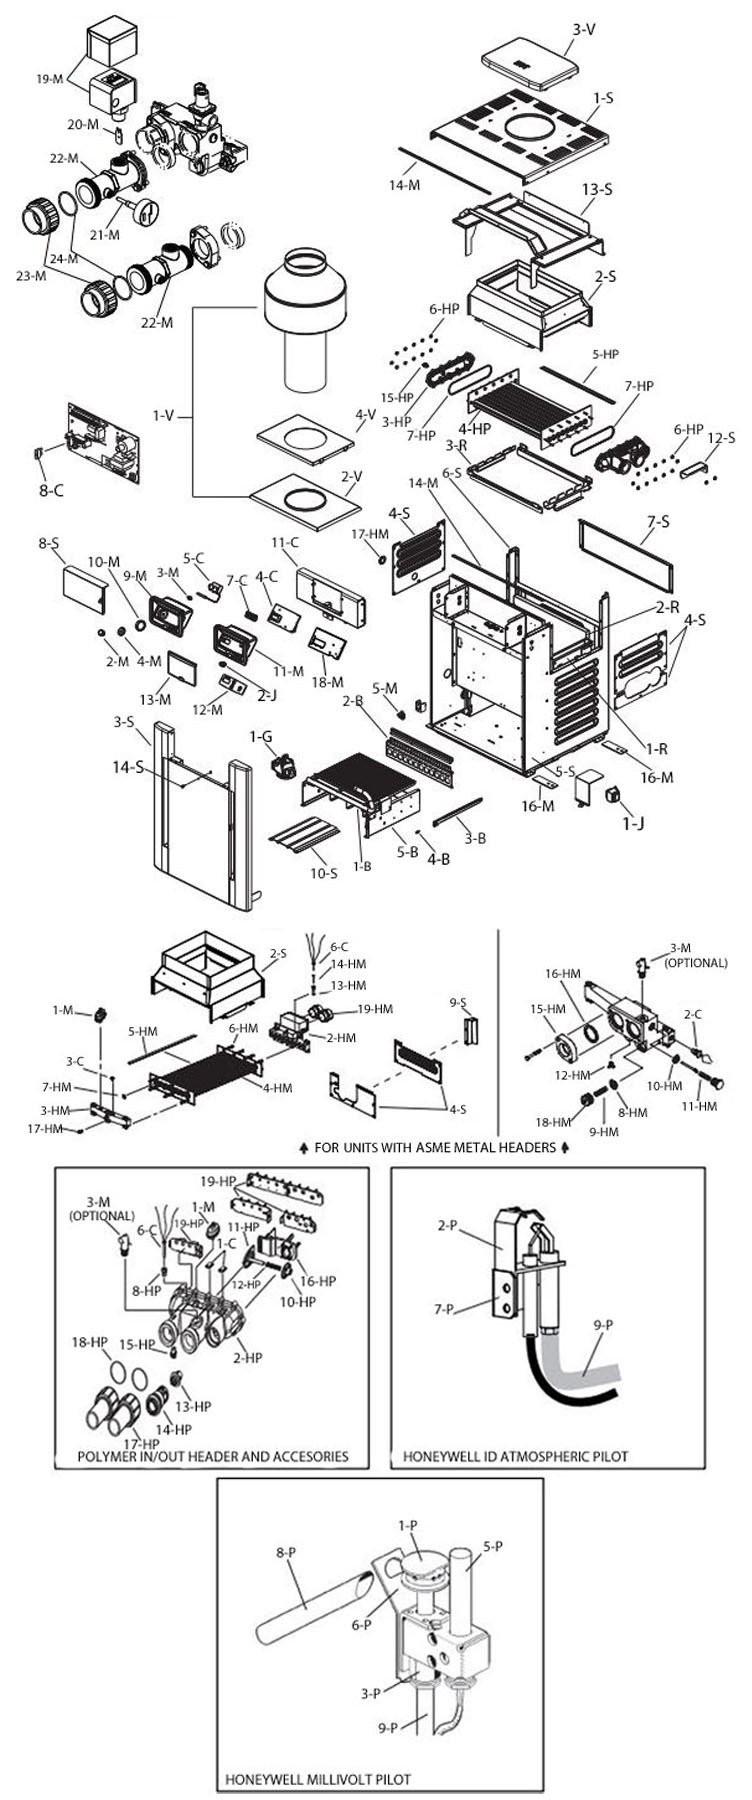 RayPak Digital Natural Gas Pool Heater 399k BTU | Electronic Ignition | Hight Altitude #52 6000-9000 Feet | P-M406A-EN-C 009973 P-R406A-EN-C 009849 Parts Schematic